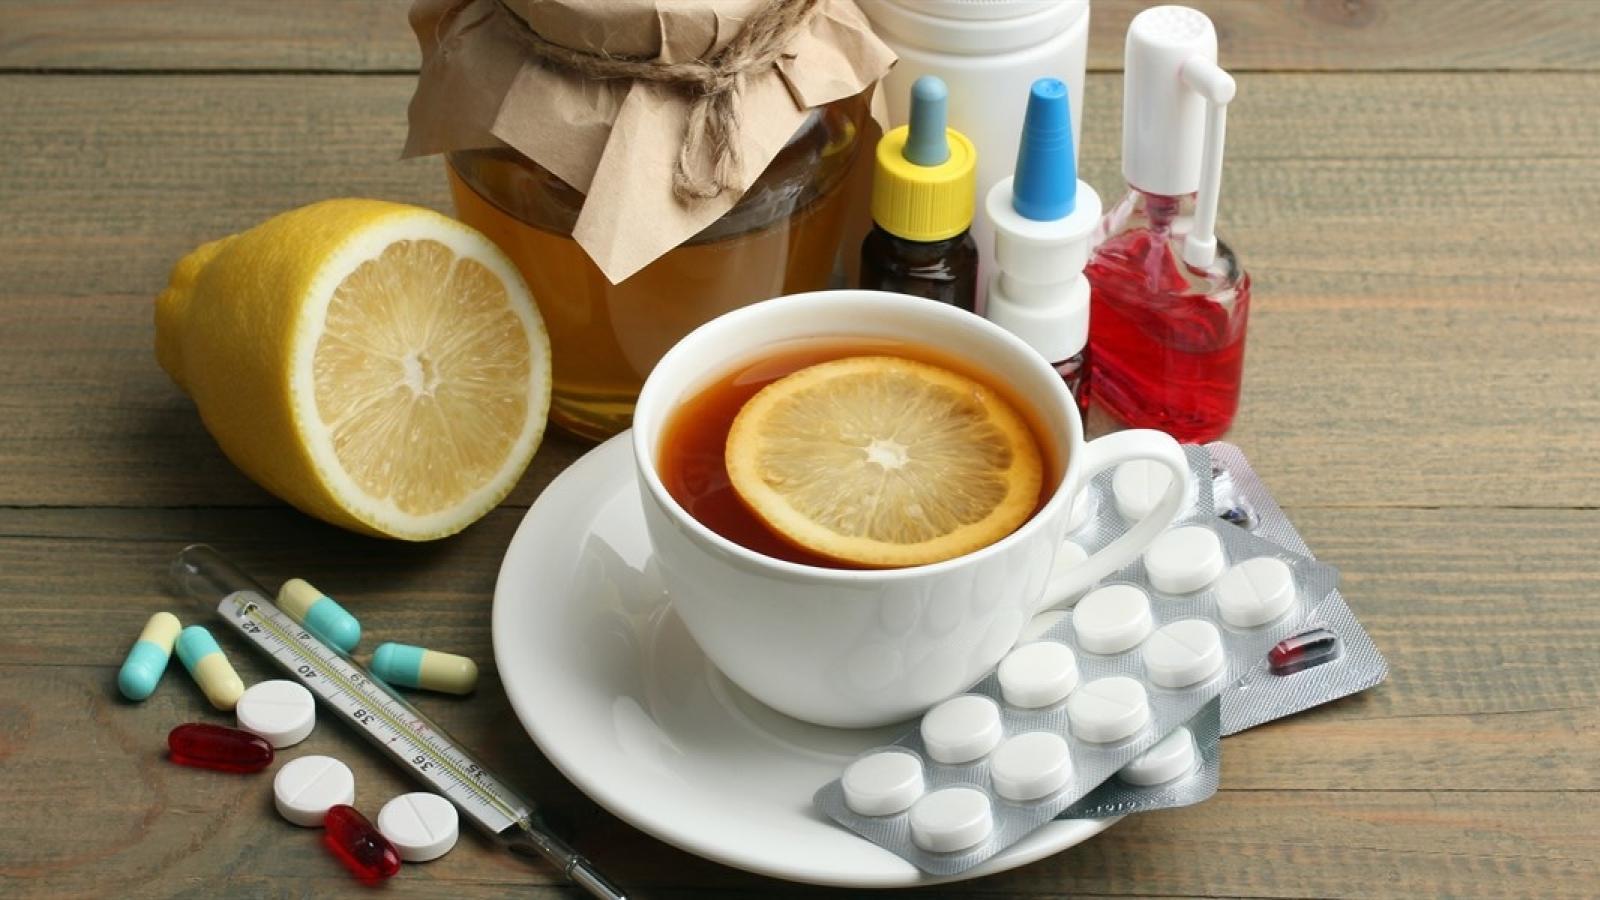 За неделю 3000 вологжан заболело гриппом и ОРВИ